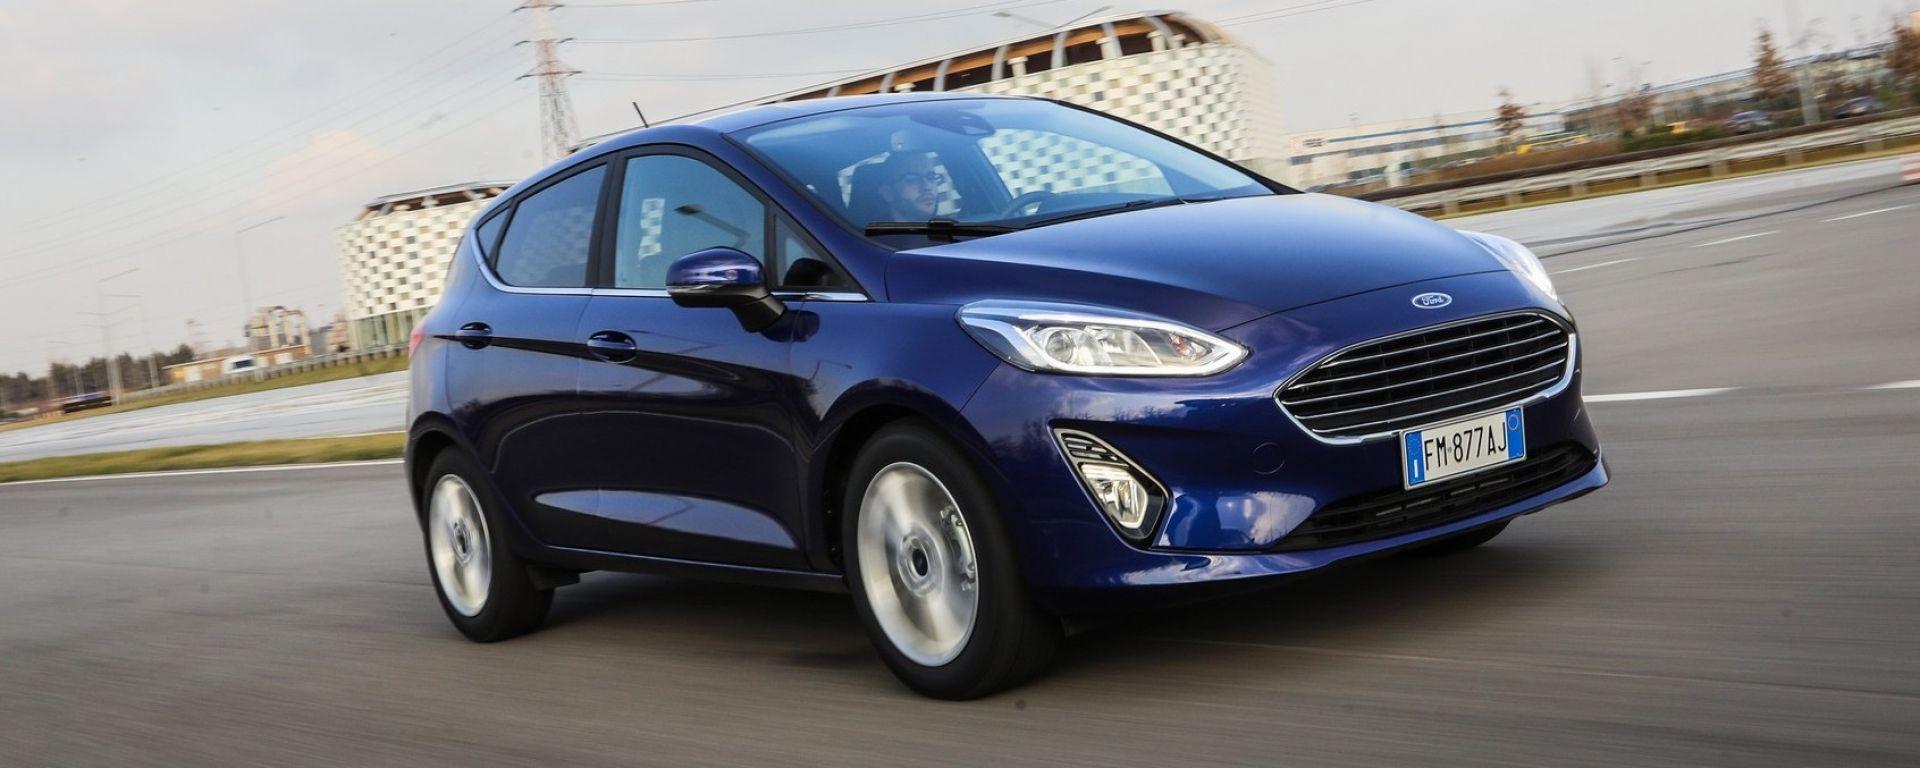 Ford Fiesta 2018: prova su strada 1.0 Ecoboost, 100CV ...